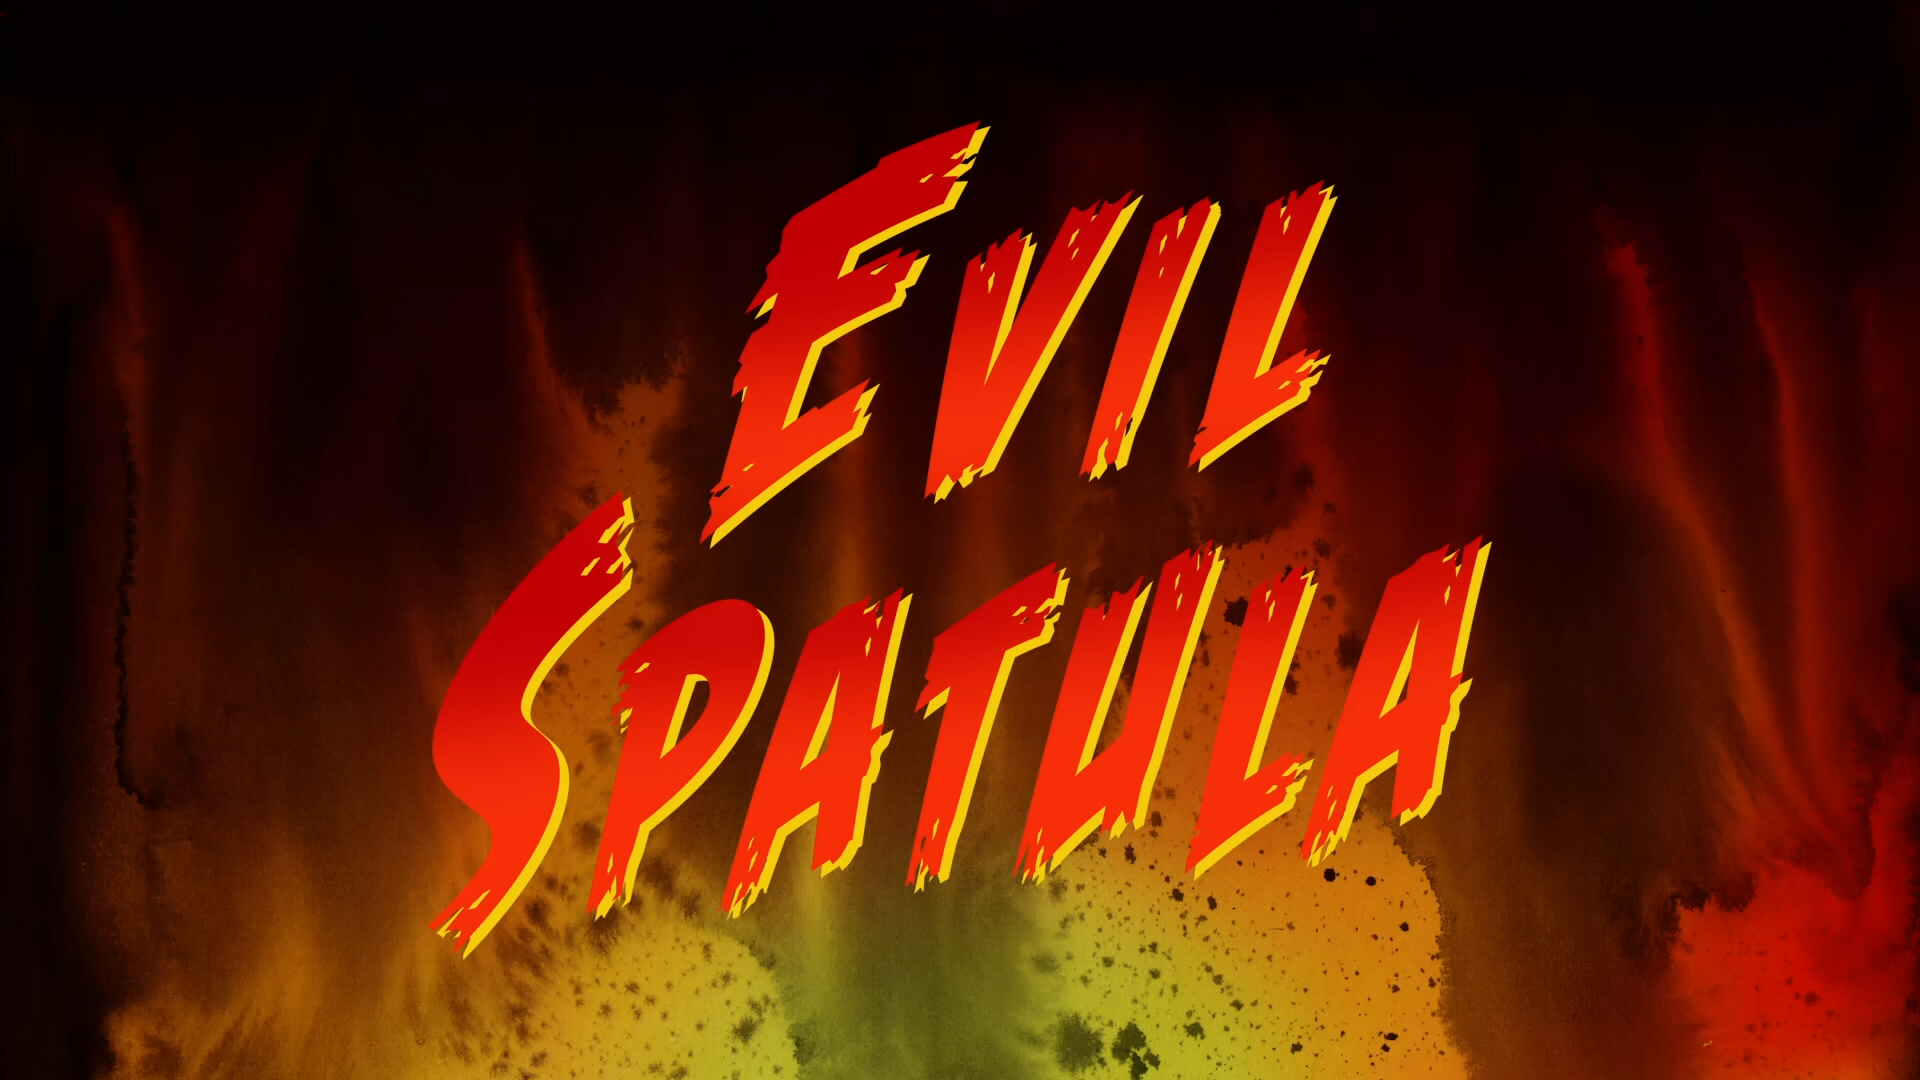 Evil Spatula/transcript